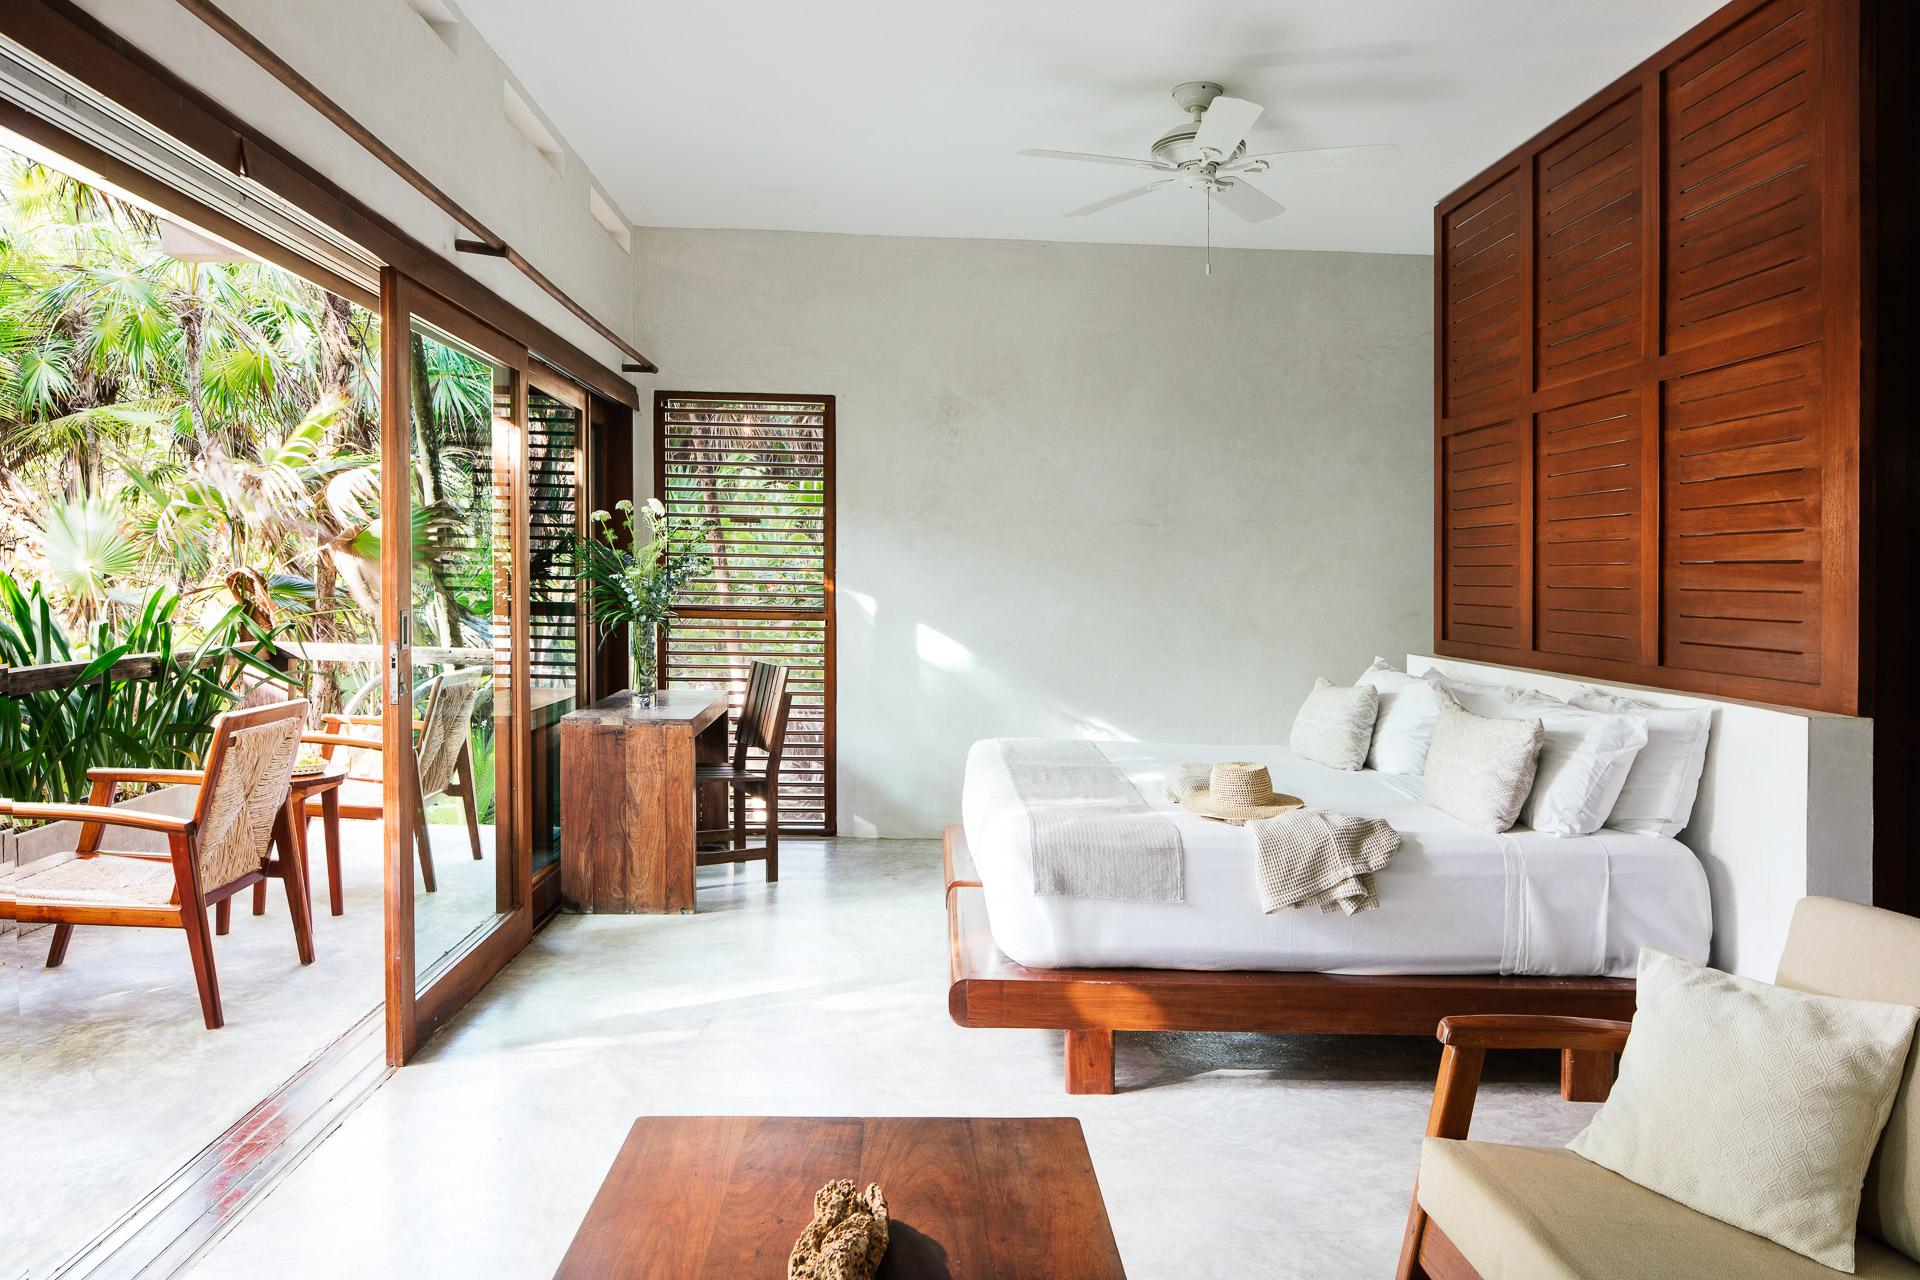 caribbean-hotel-resort-photographer-olas-tulum-mexico--3.jpg